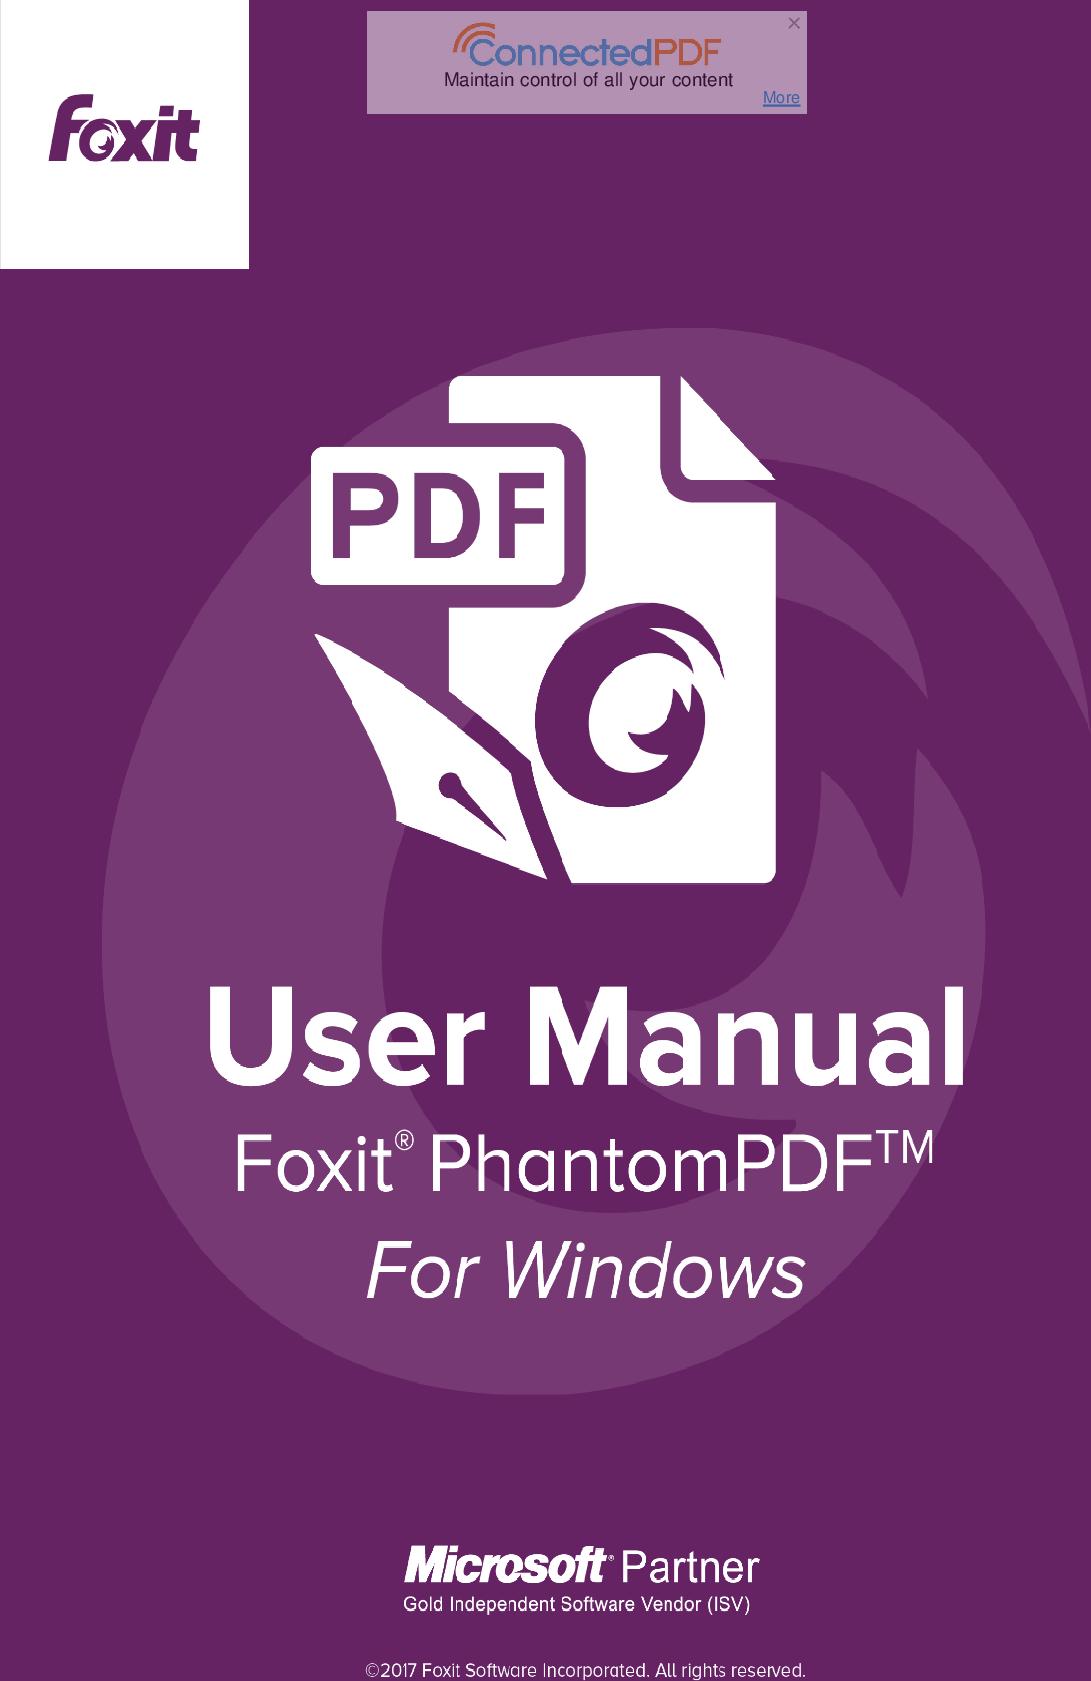 Foxit Phantom PDF 8.3 For Windows Operation Manual PDF83 EN